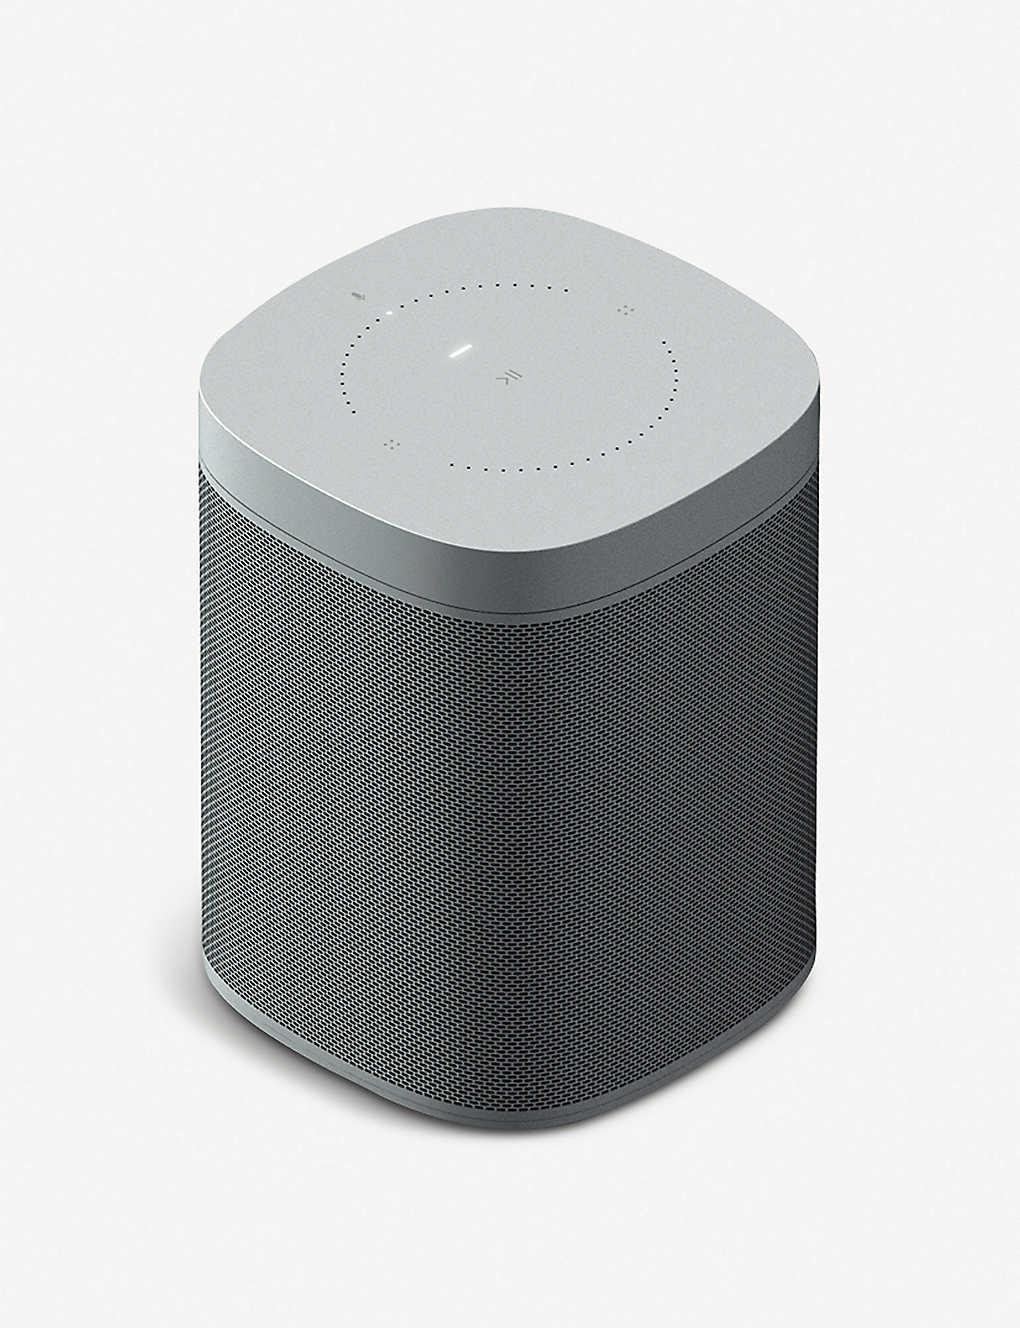 e7811a0f3e4c HAY - HAY x SONOS One limited edition wireless smart speaker ...